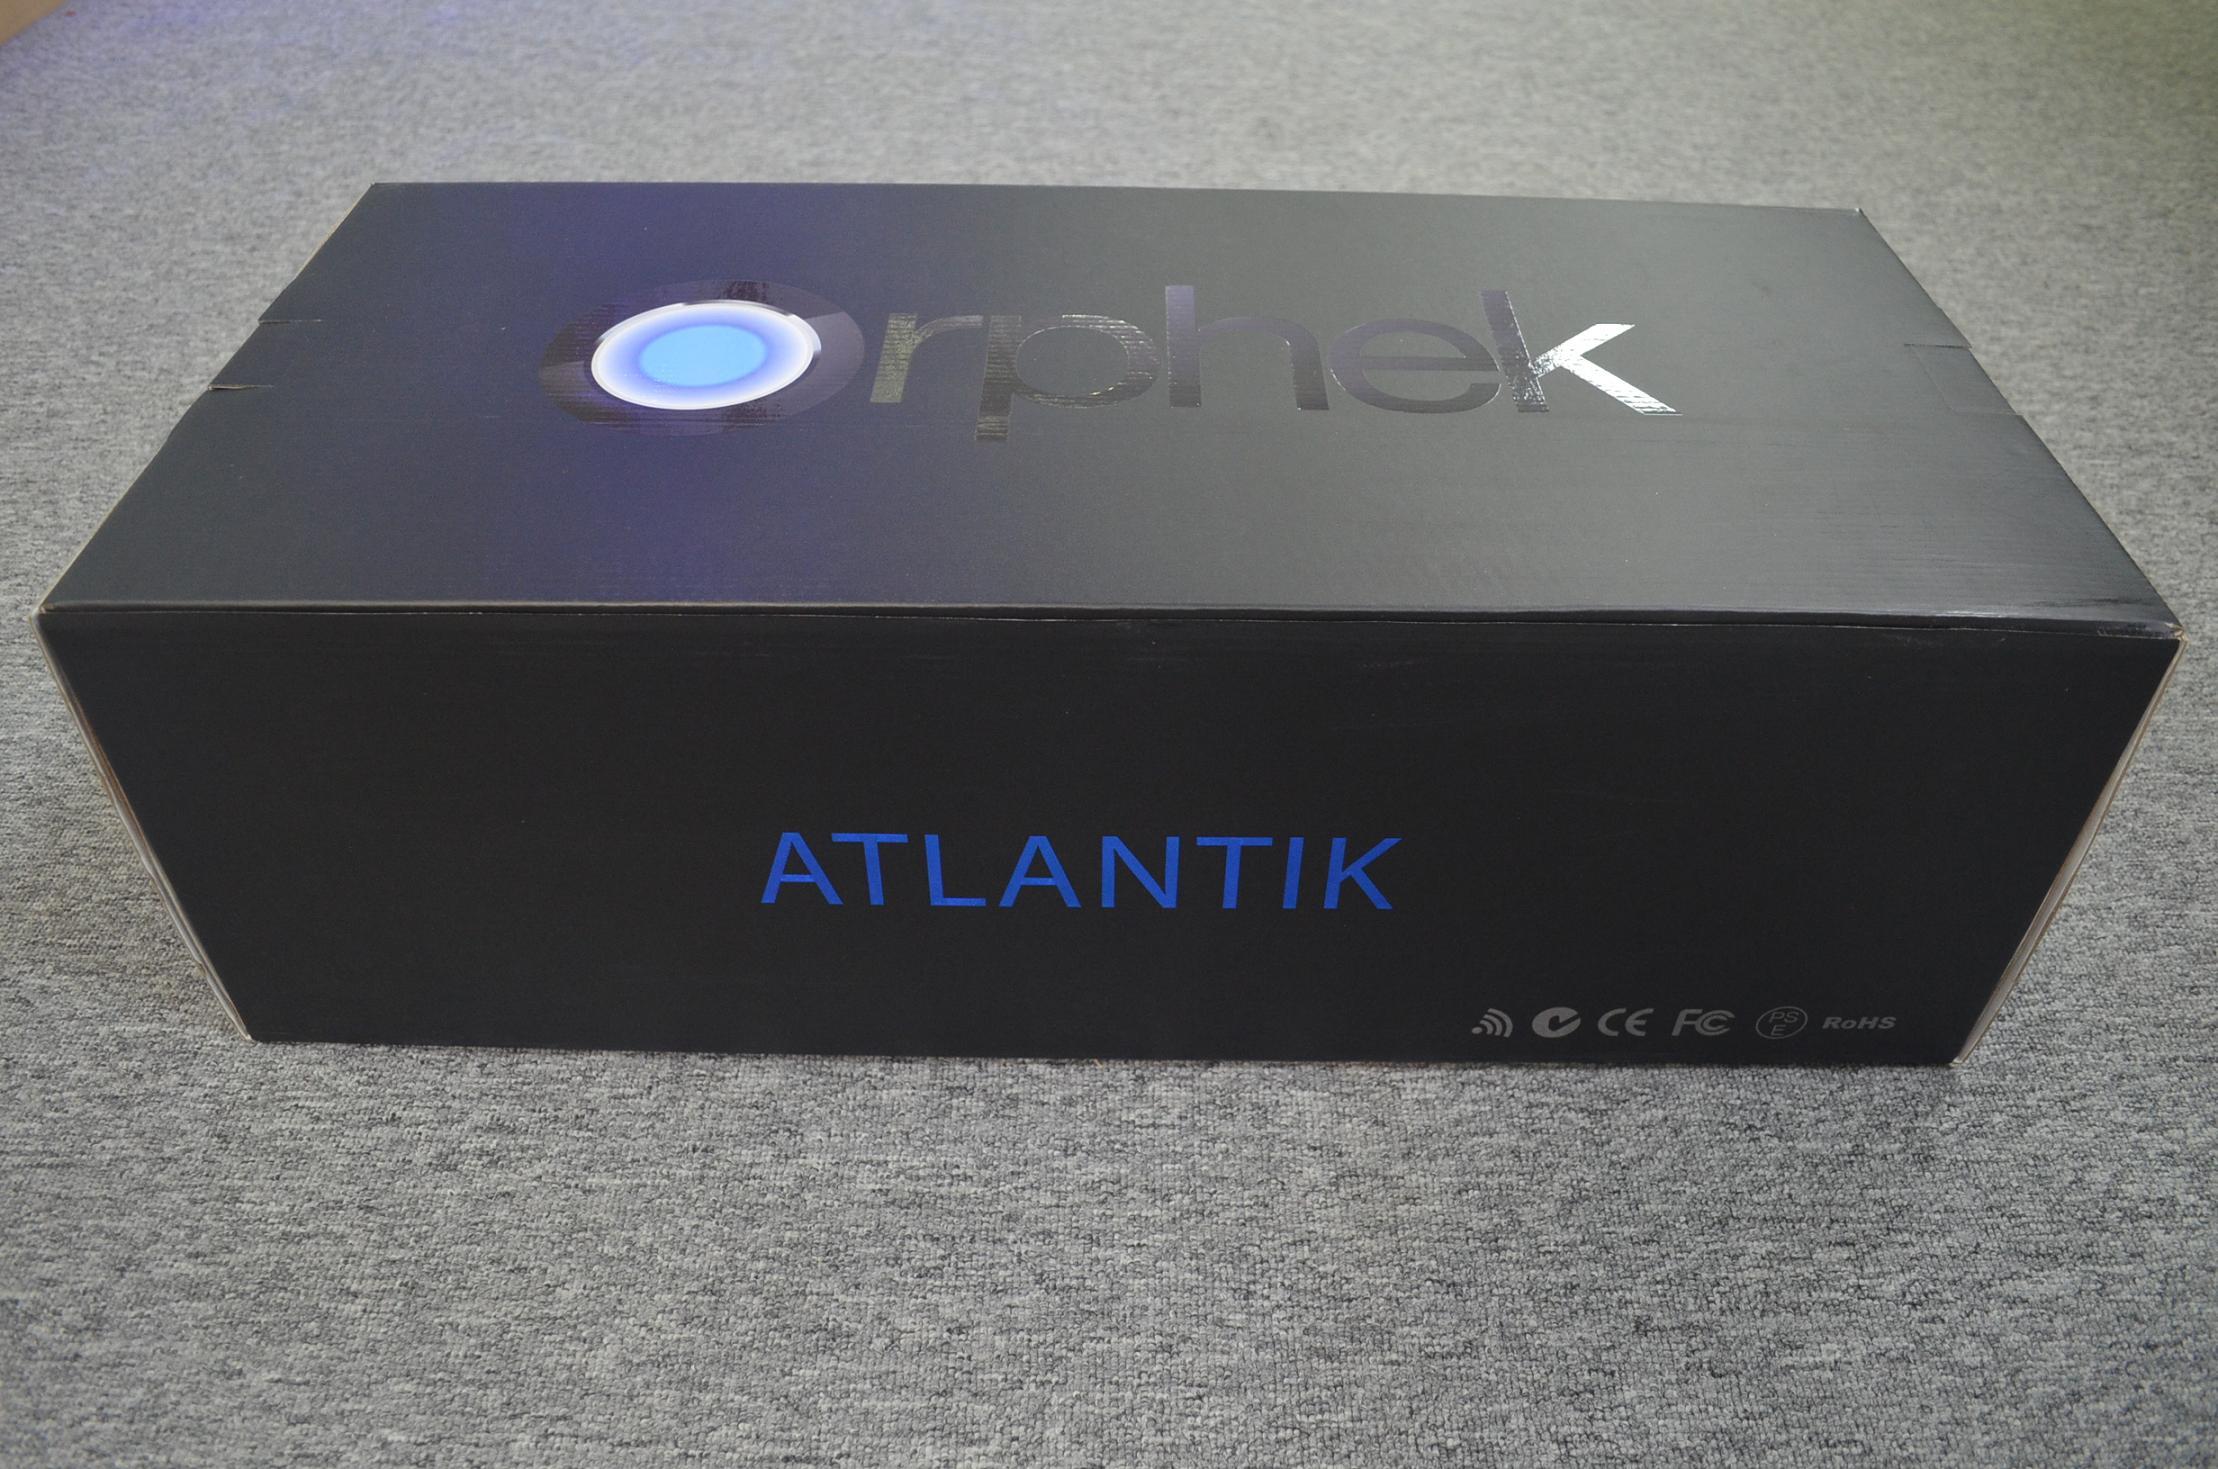 Atlantik_0776.jpg